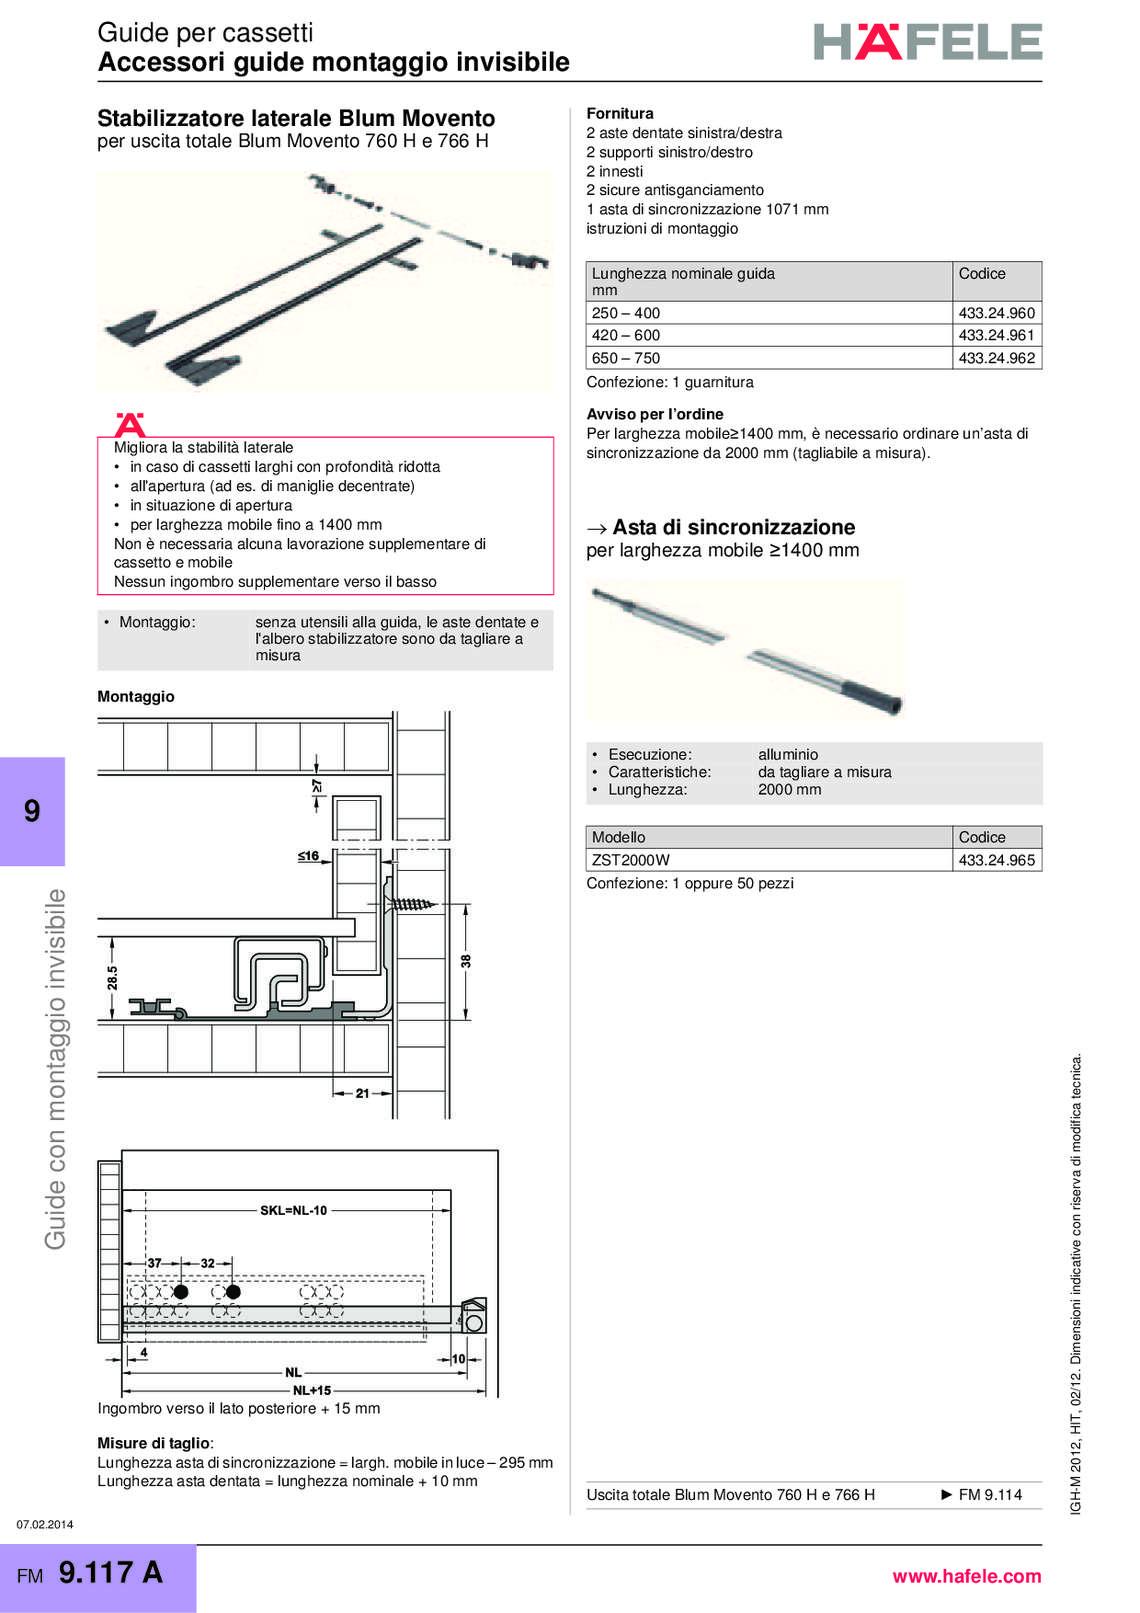 hafele-spondine-e-guide-per-mobili_40_167.jpg